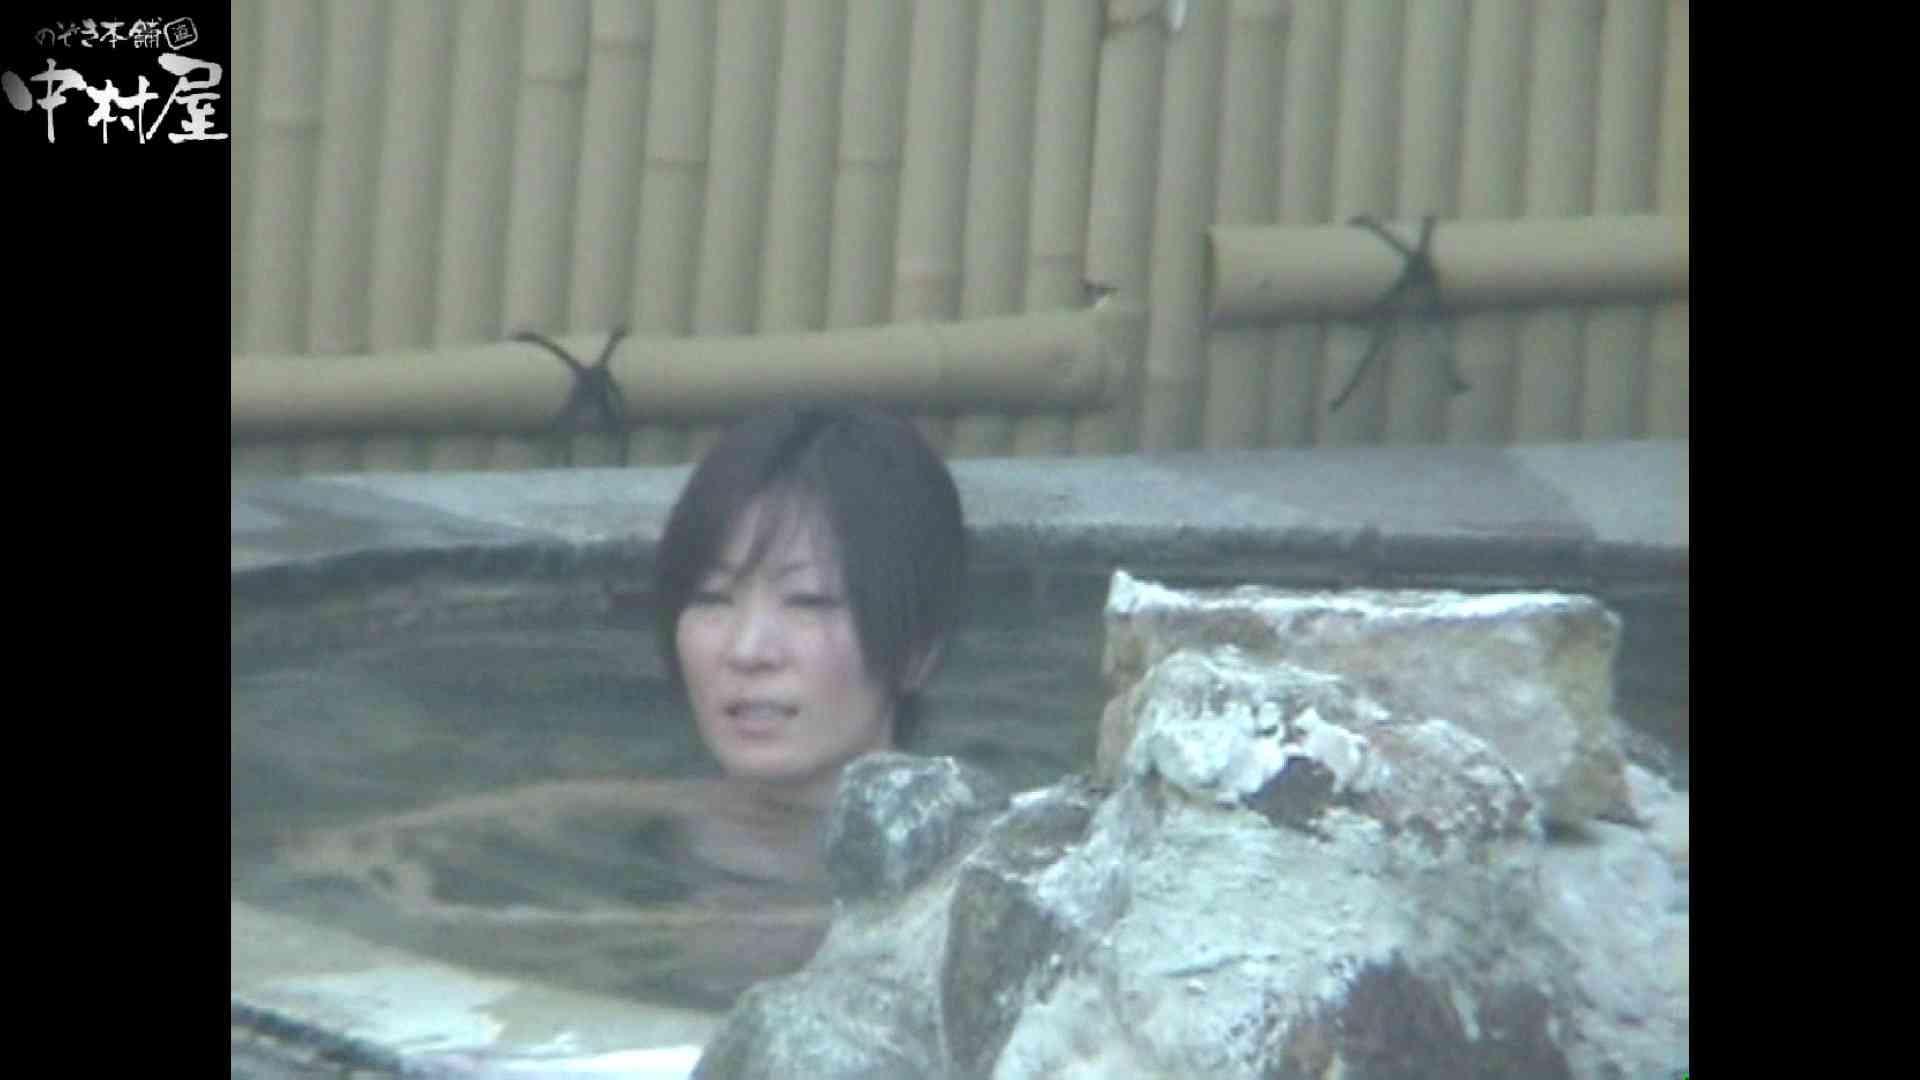 Aquaな露天風呂Vol.972 露天   OLセックス  80画像 22